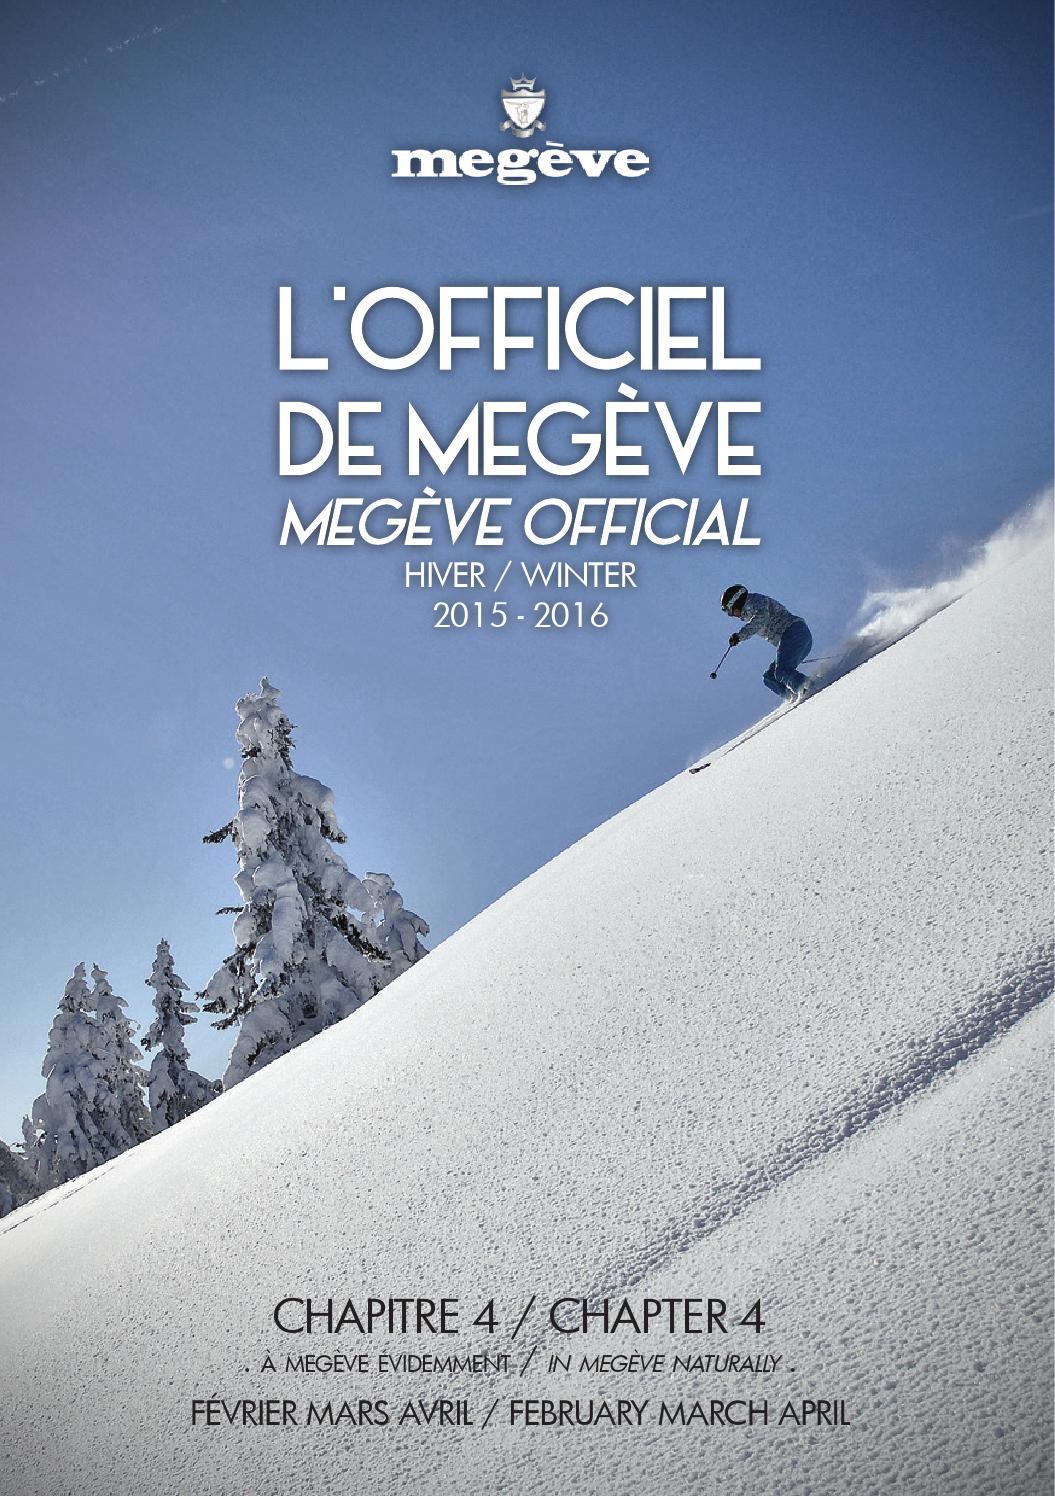 Rossignol Messieurs Ski Hiver Gants Gants Speed Choix De Couleur